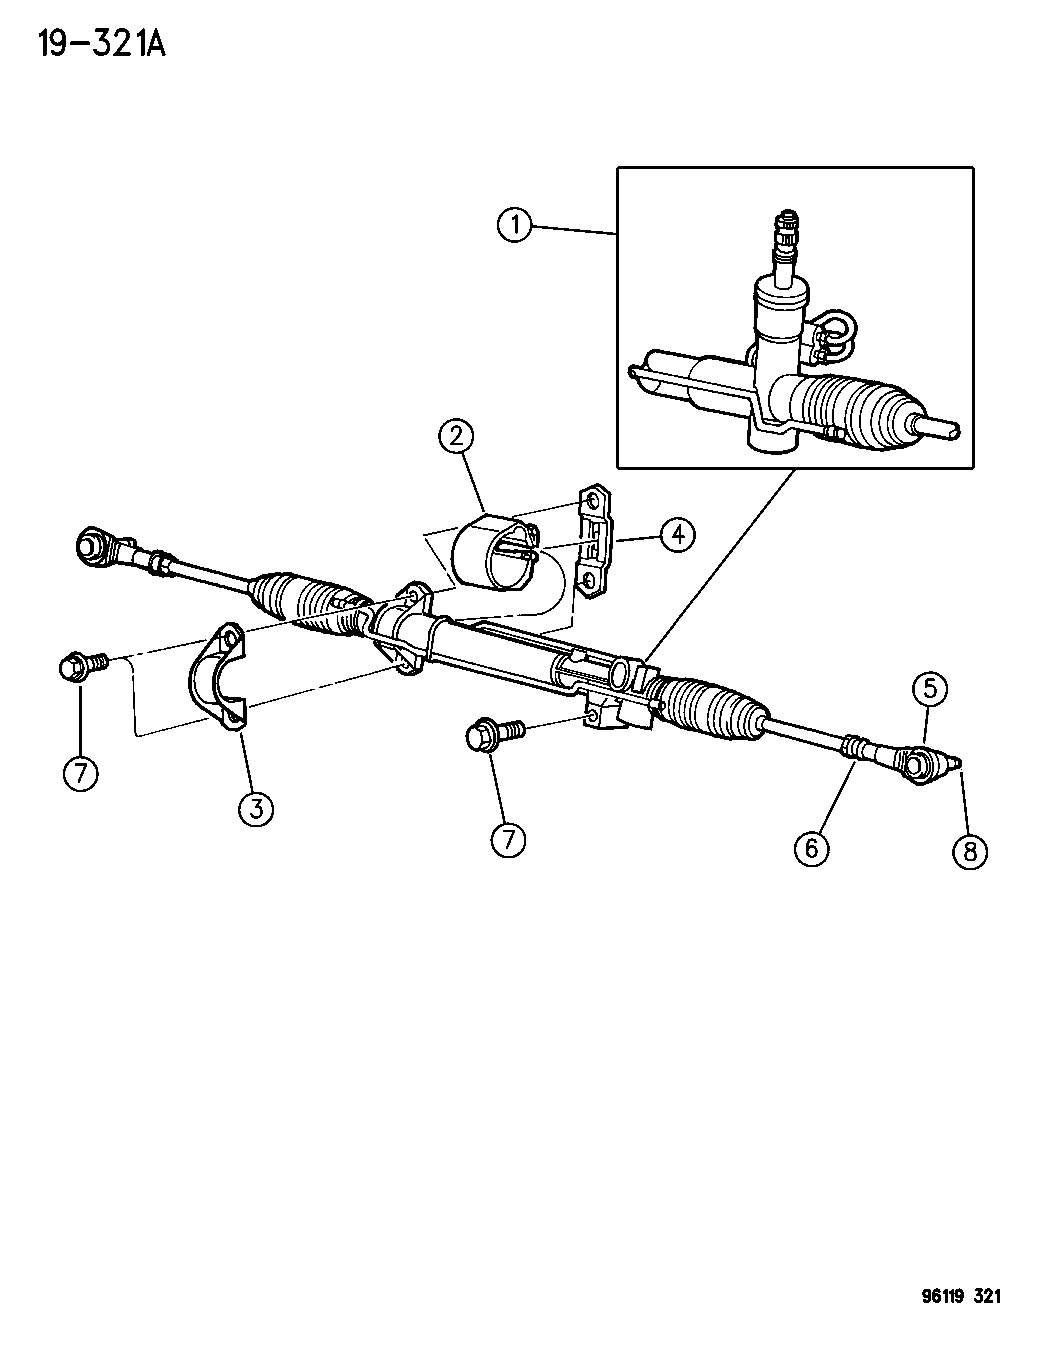 1996 dodge caravan transmission parts diagram  u2022 wiring